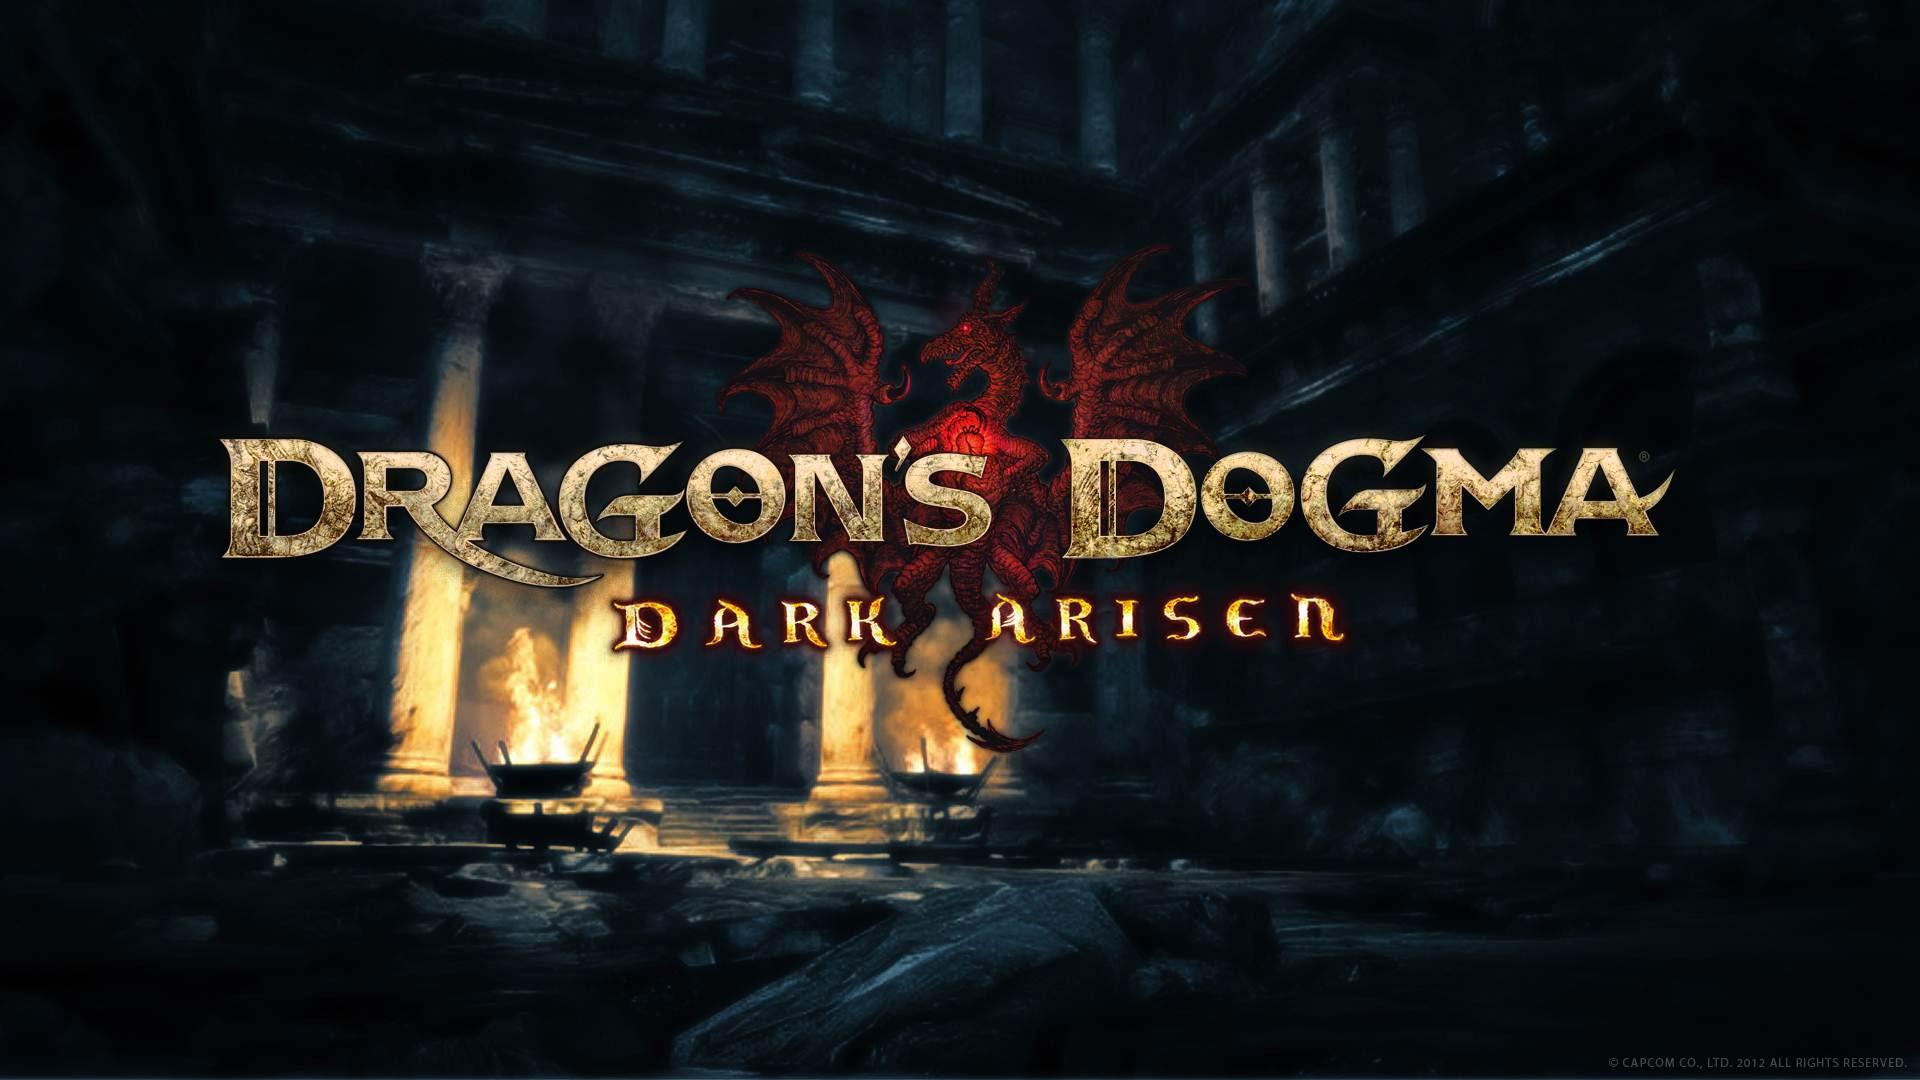 Iphone X Cool Wallpaper Features Dragon S Dogma Dark Arisen Wallpapers In Ultra Hd 4k